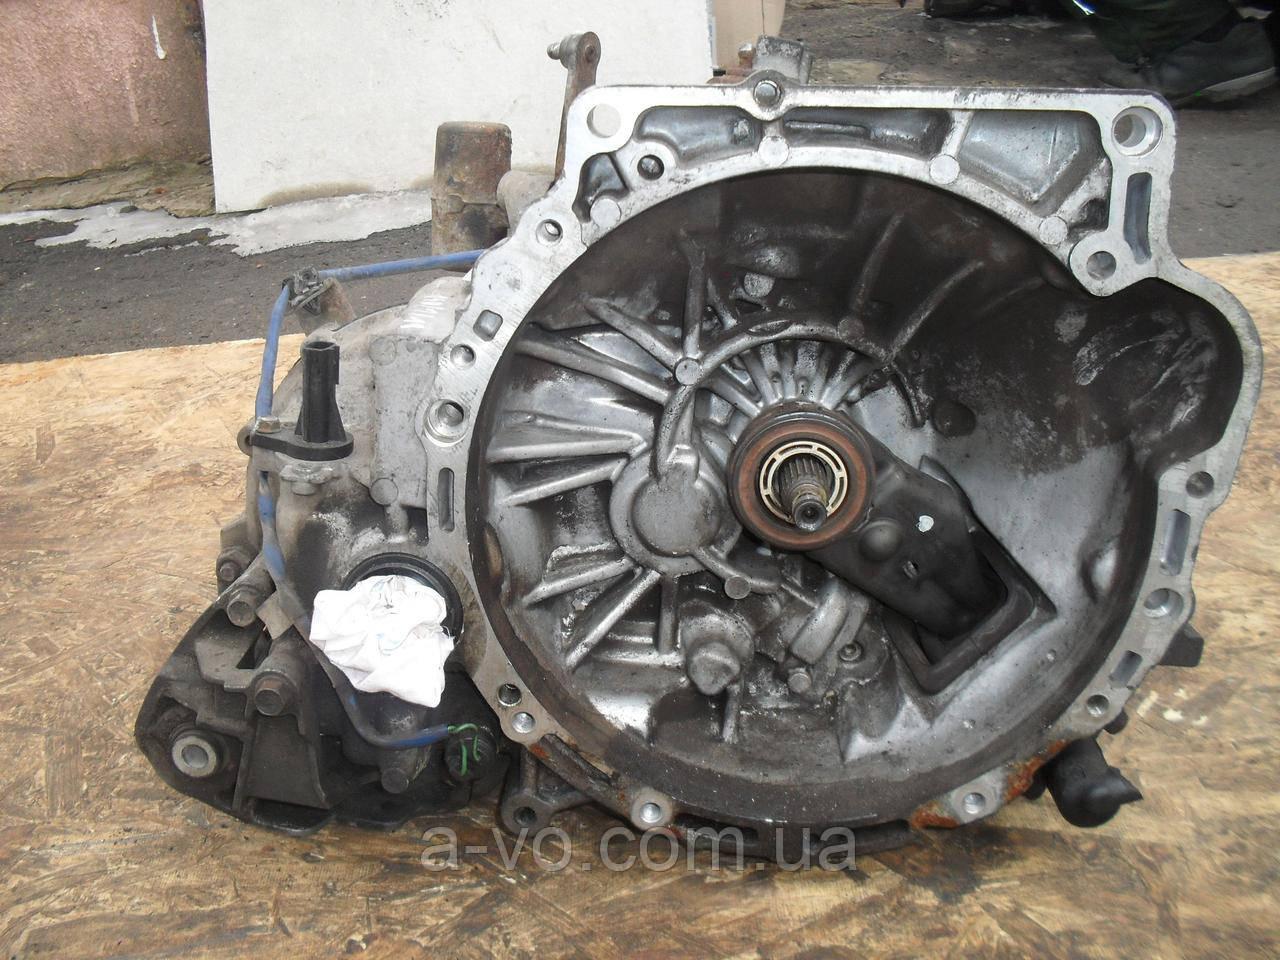 КПП Коробка передач Mazda 3 1.6B